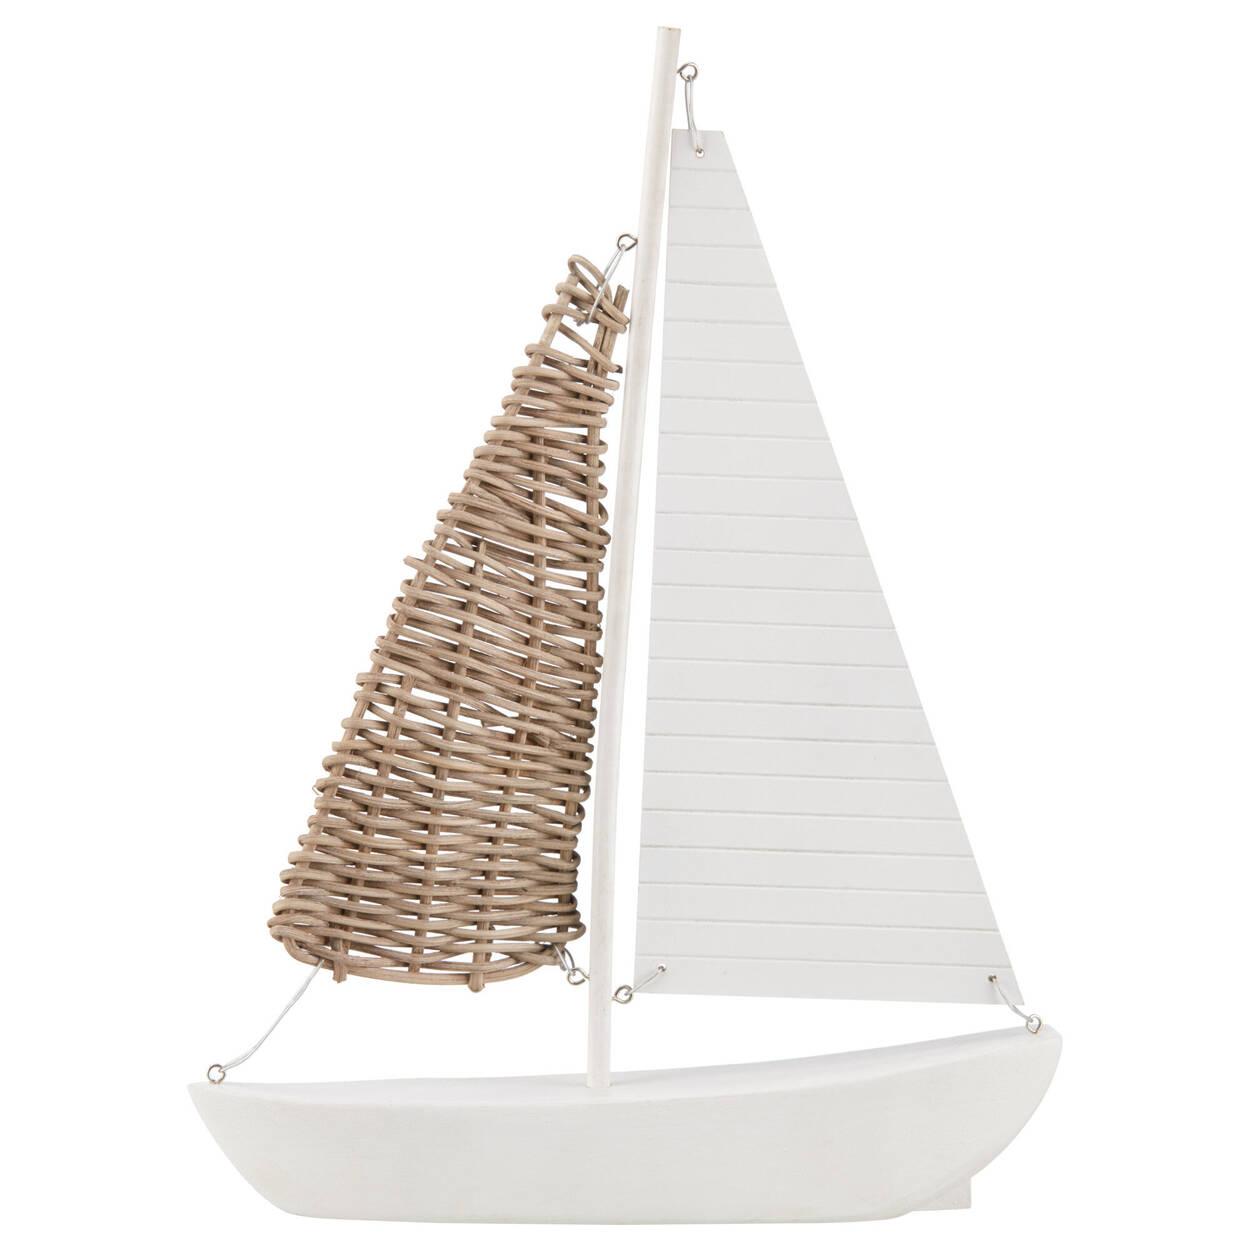 Decorative White Sailboat With Rattan